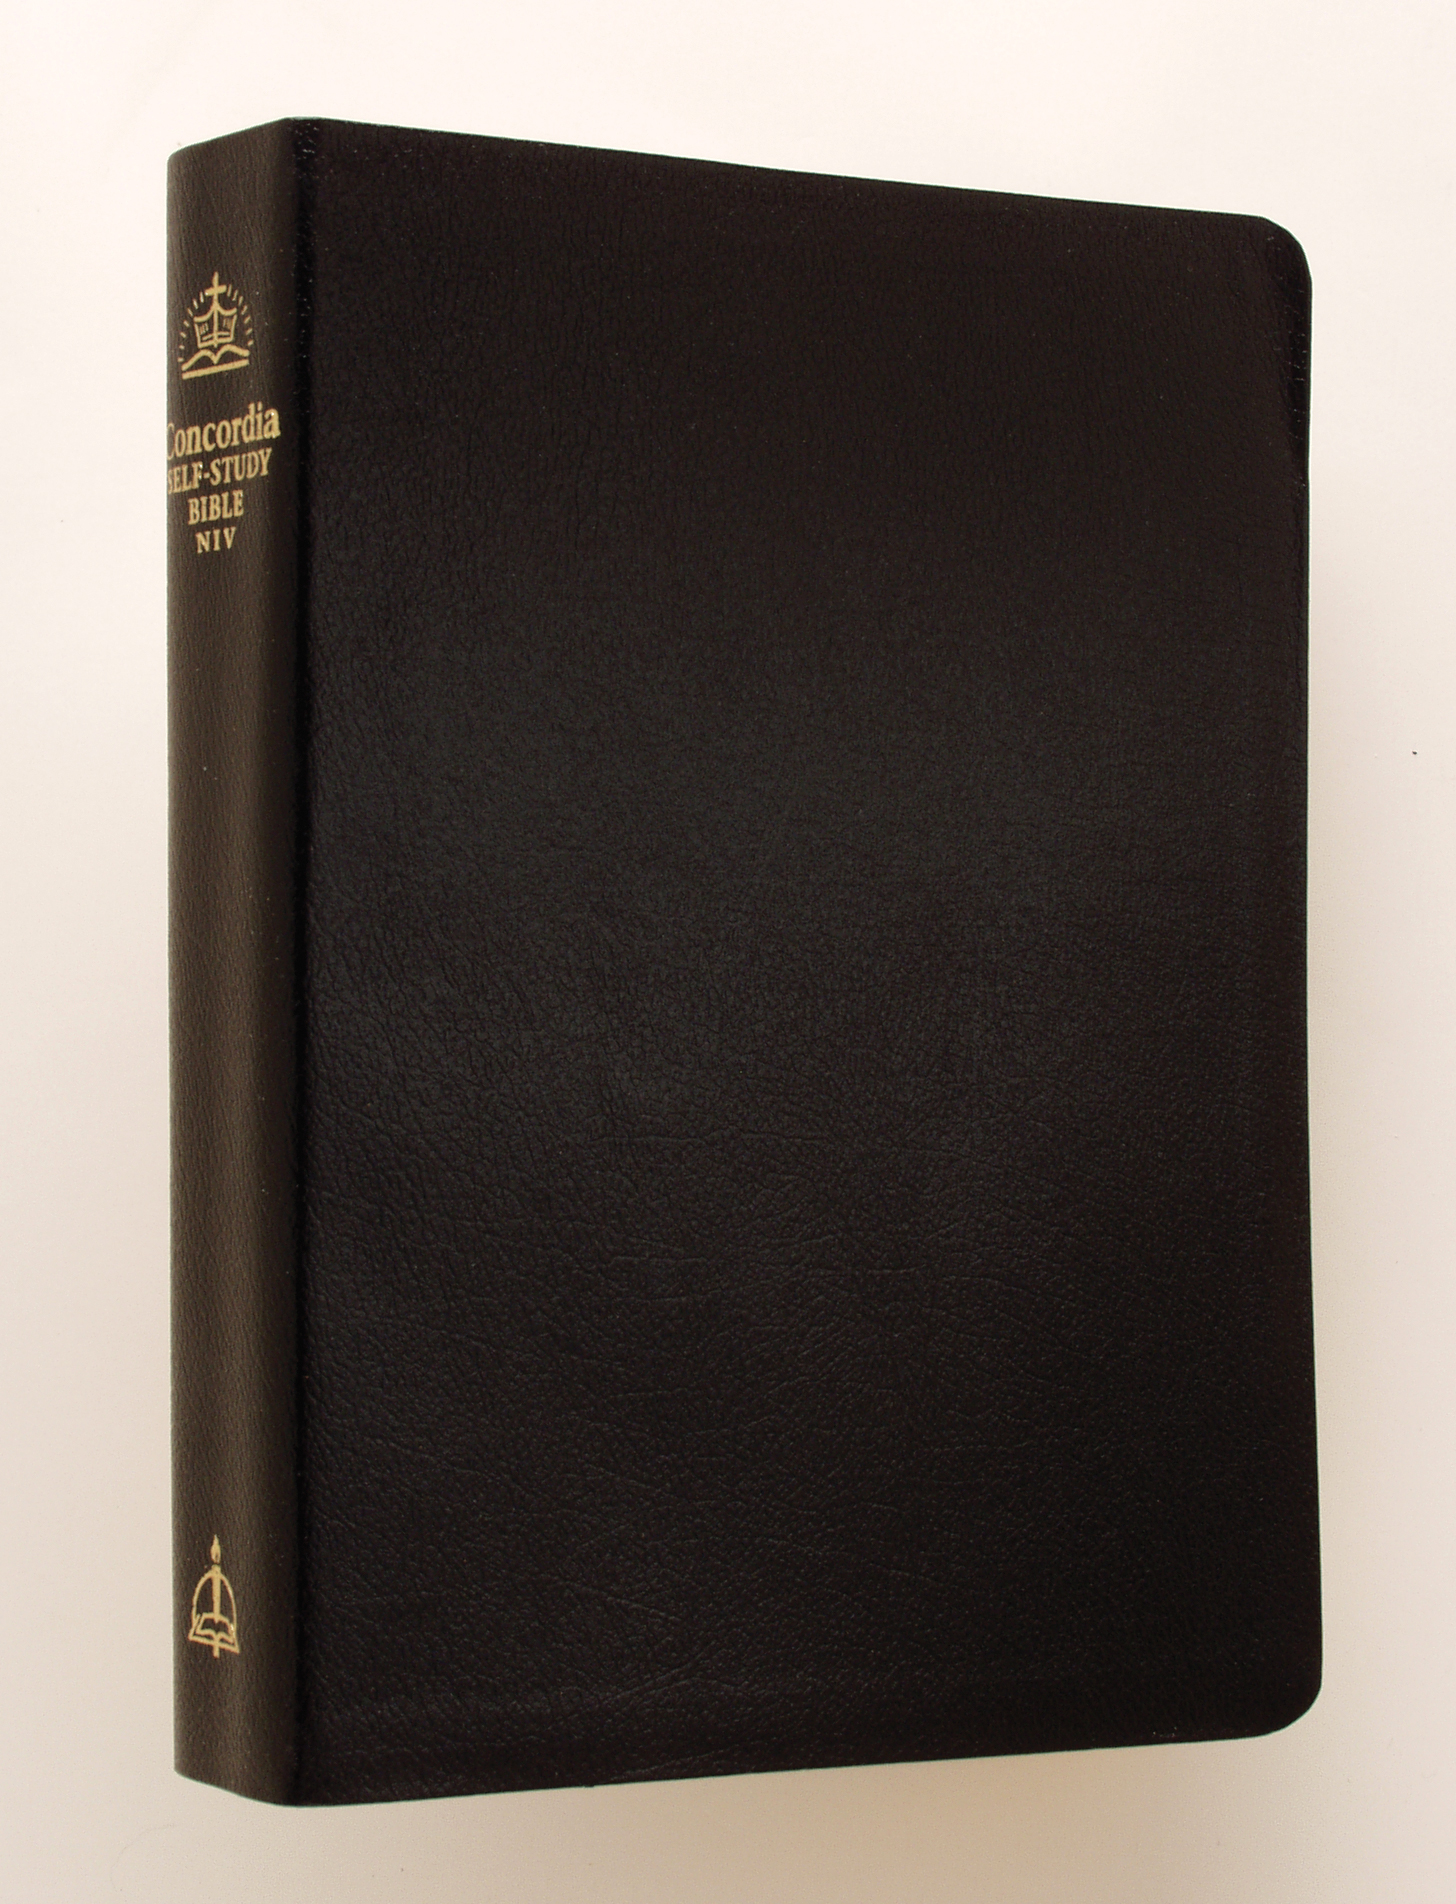 The Lutheran Study Bible OR Concordia Self